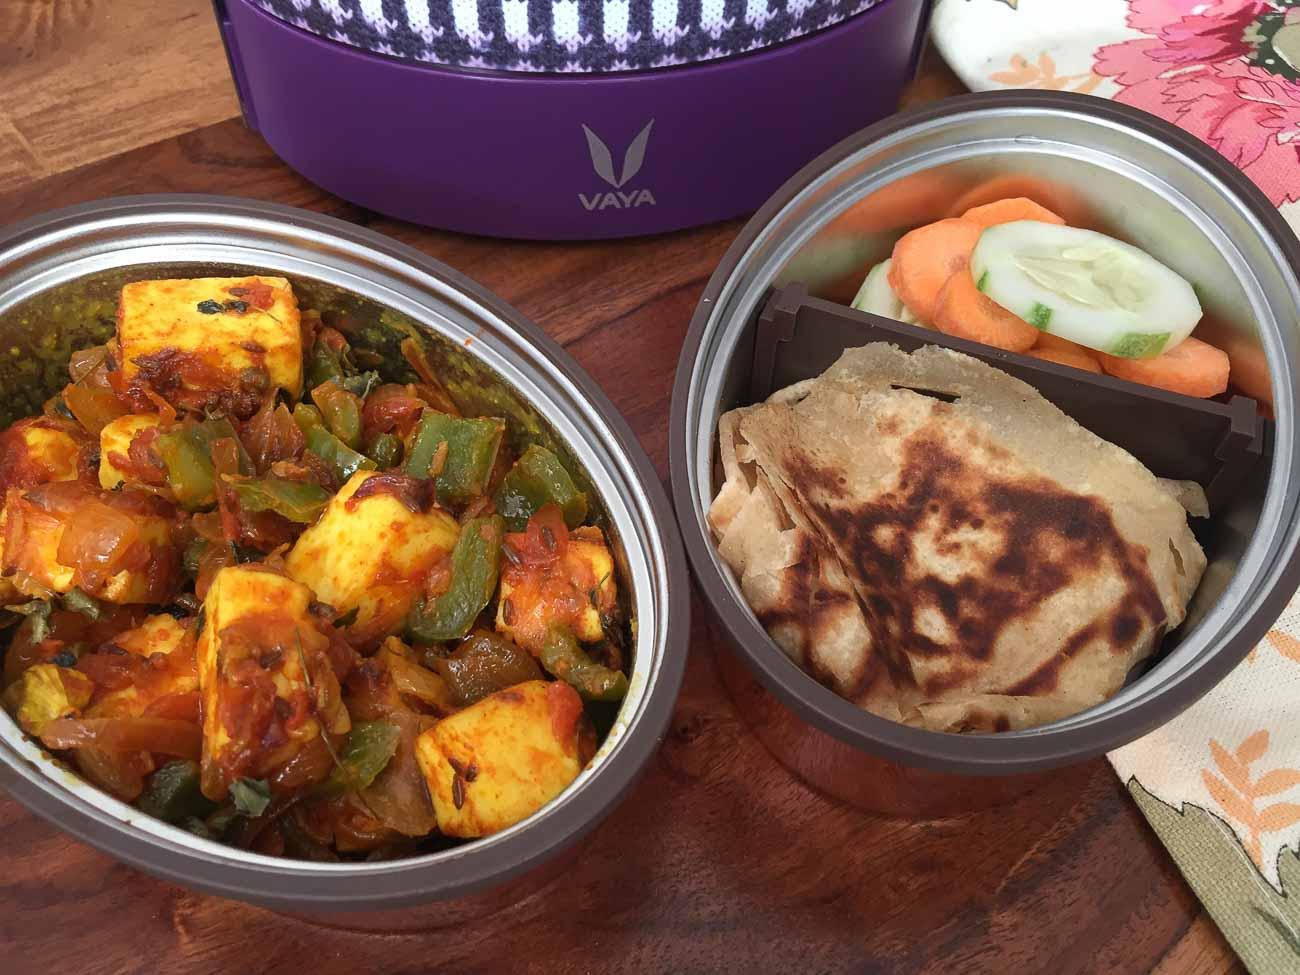 Cake Ki Recipe Kadai Mein: Kids Lunch With Vaya: Kadai Paneer, Tawa Paratha, Salad By